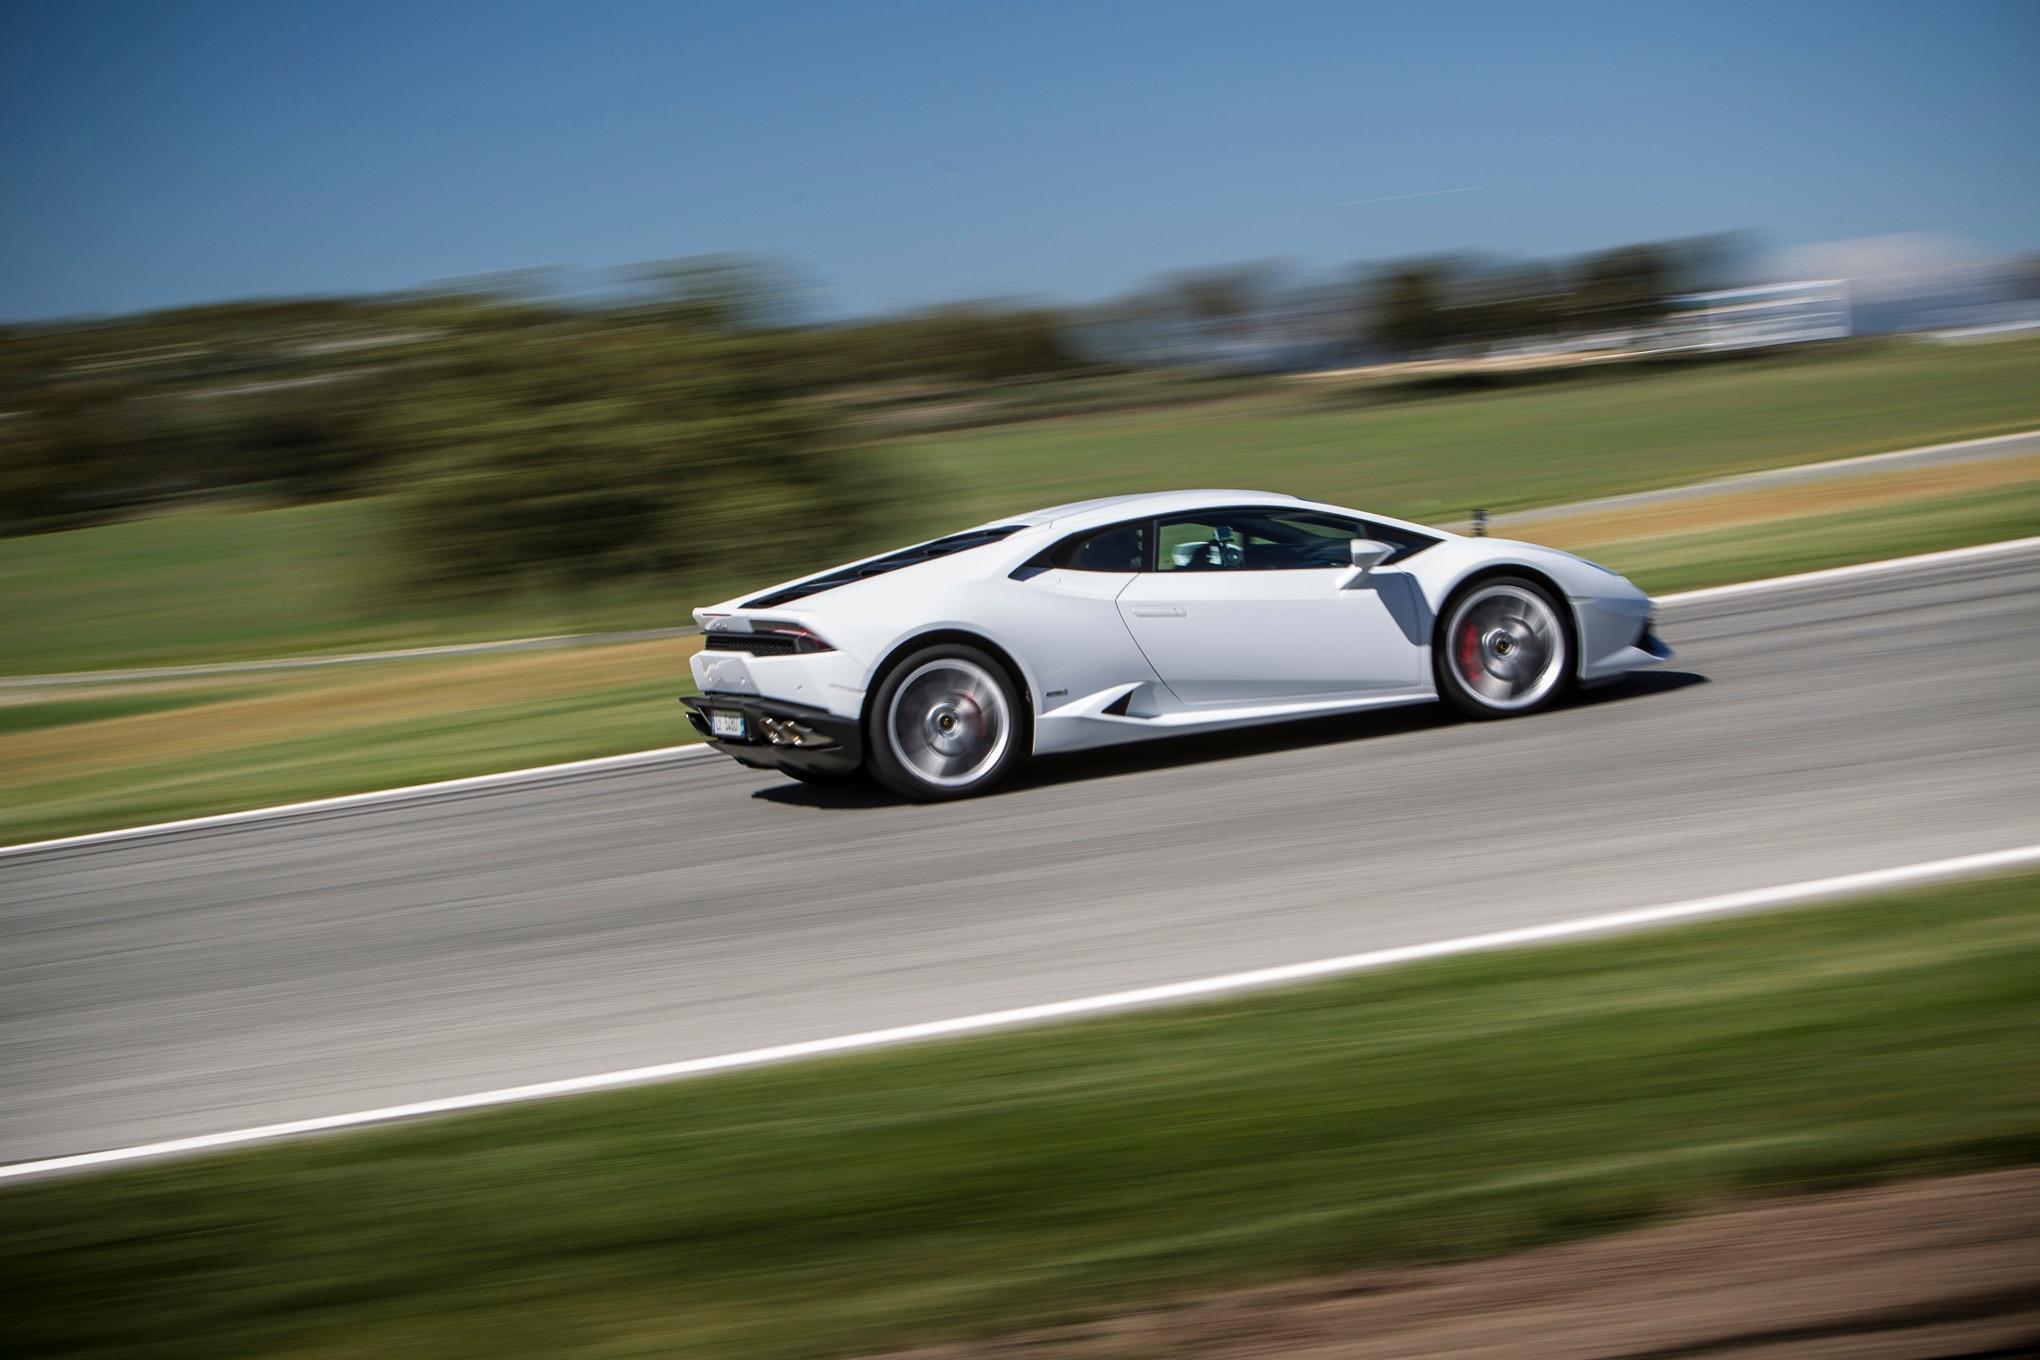 2015-Lamborghini-Huracan-LP-610-4-track-white-side-in-motion Amazing 2015 Lamborghini Huracan Price Per Month Cars Trend